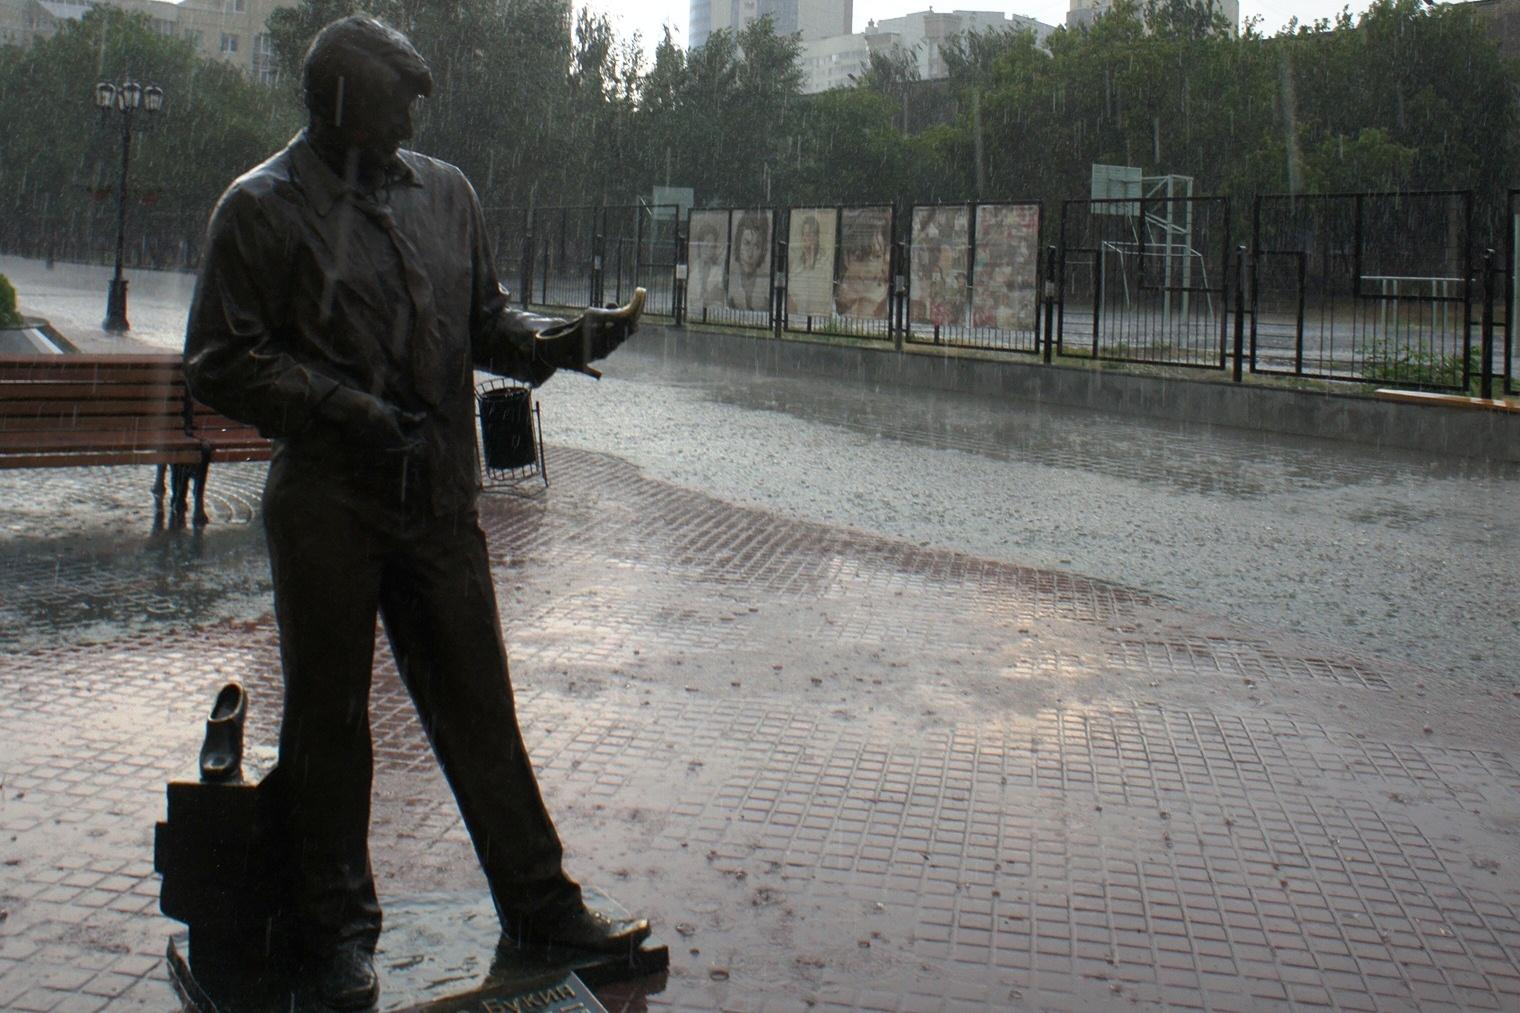 Не забудьте зонтики! МЧС предупреждает свердловчан о непогоде